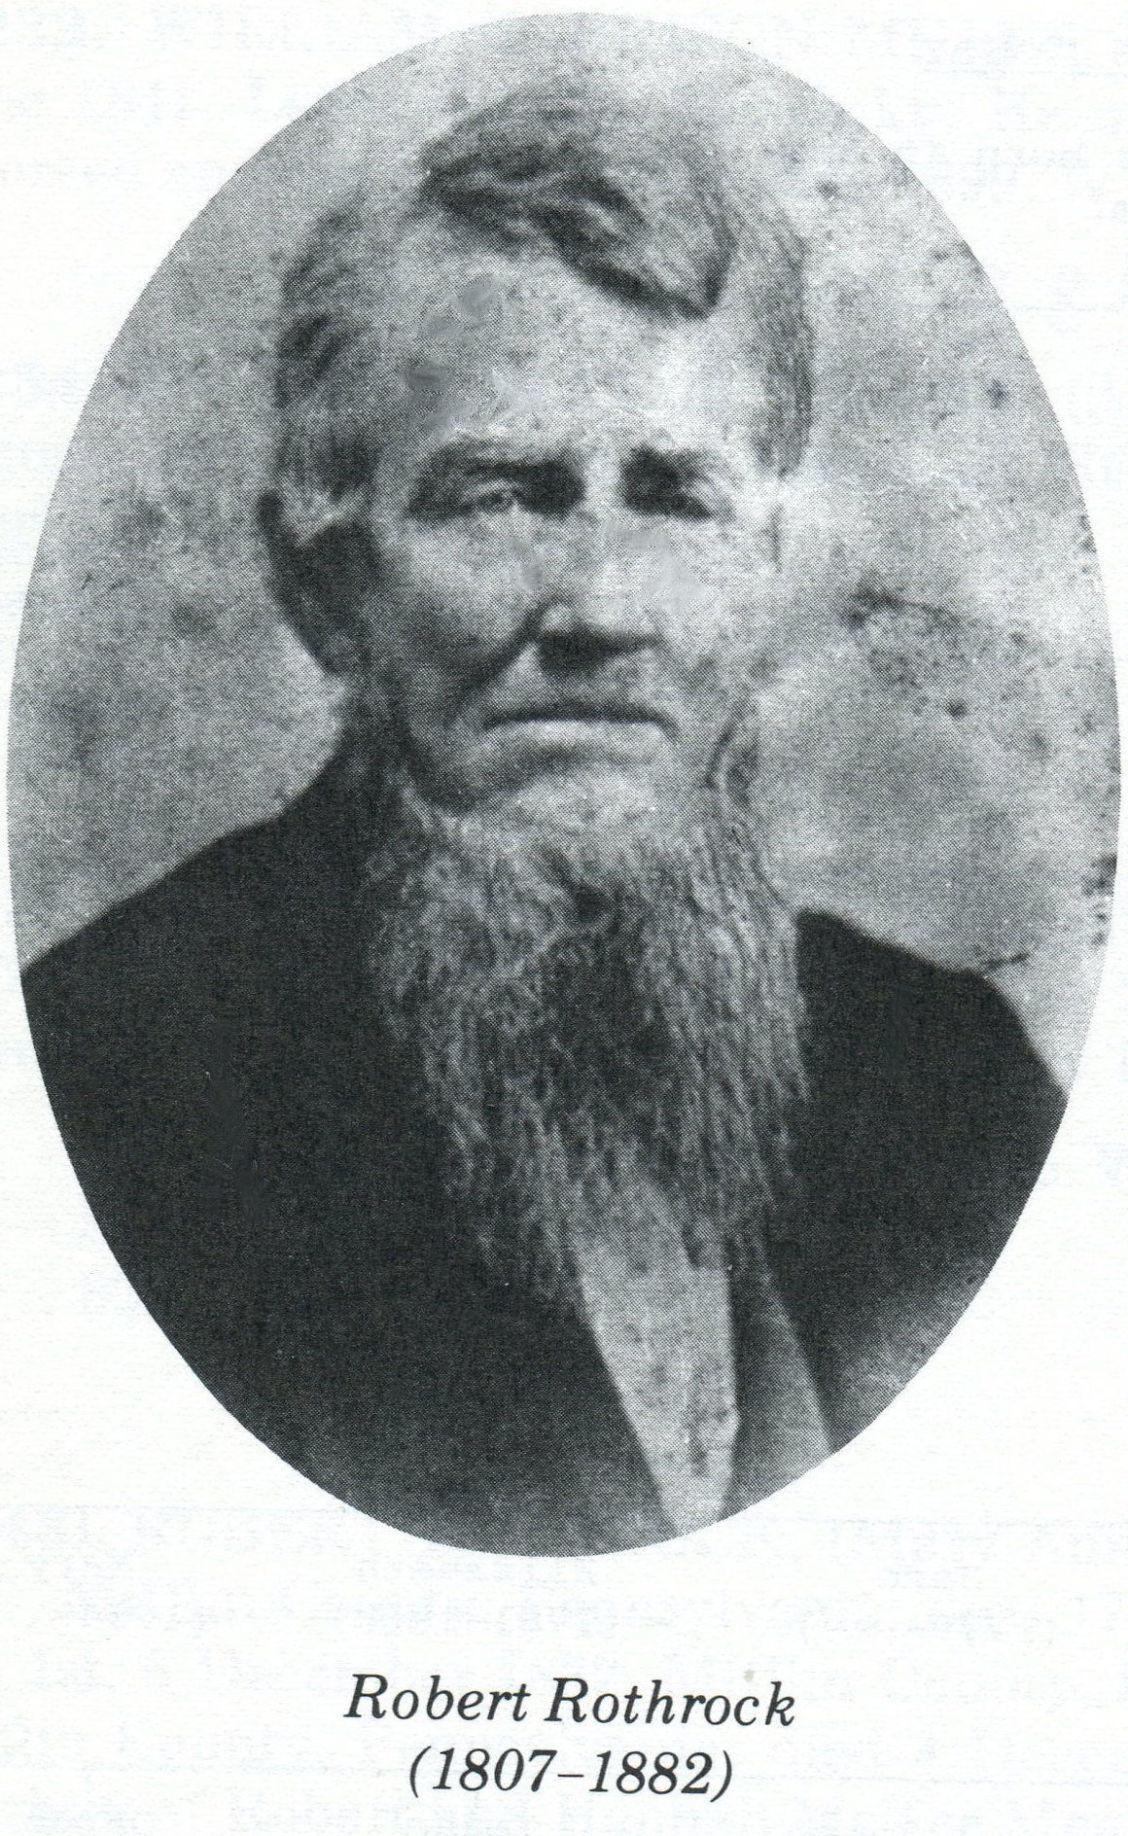 Robert Rothrock